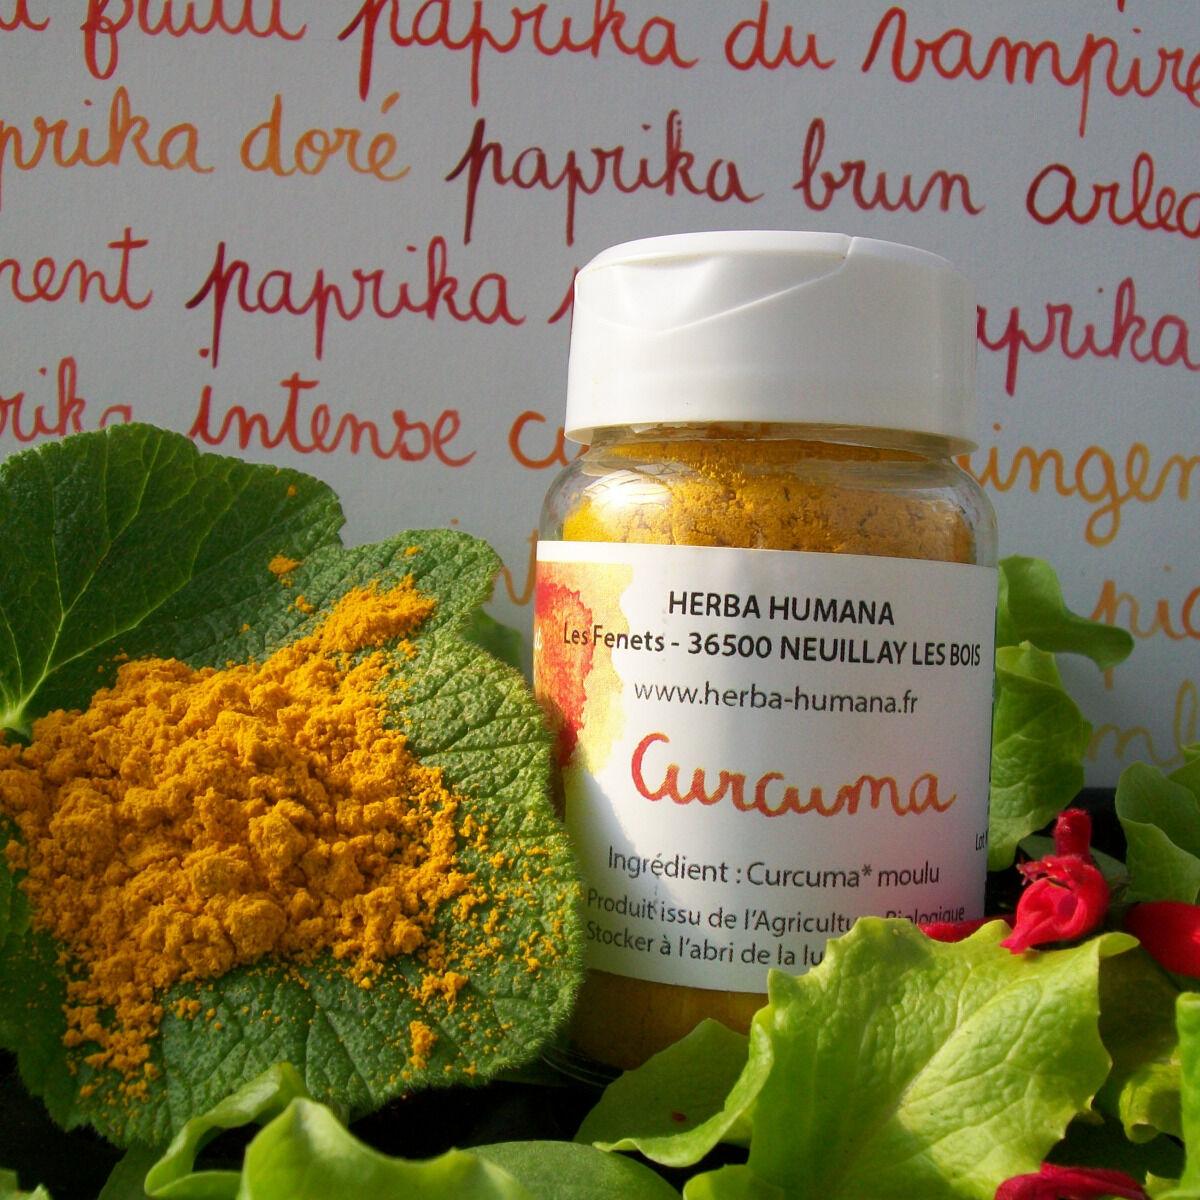 HERBA HUMANA Curcuma Bio Cultivé en France 25 g